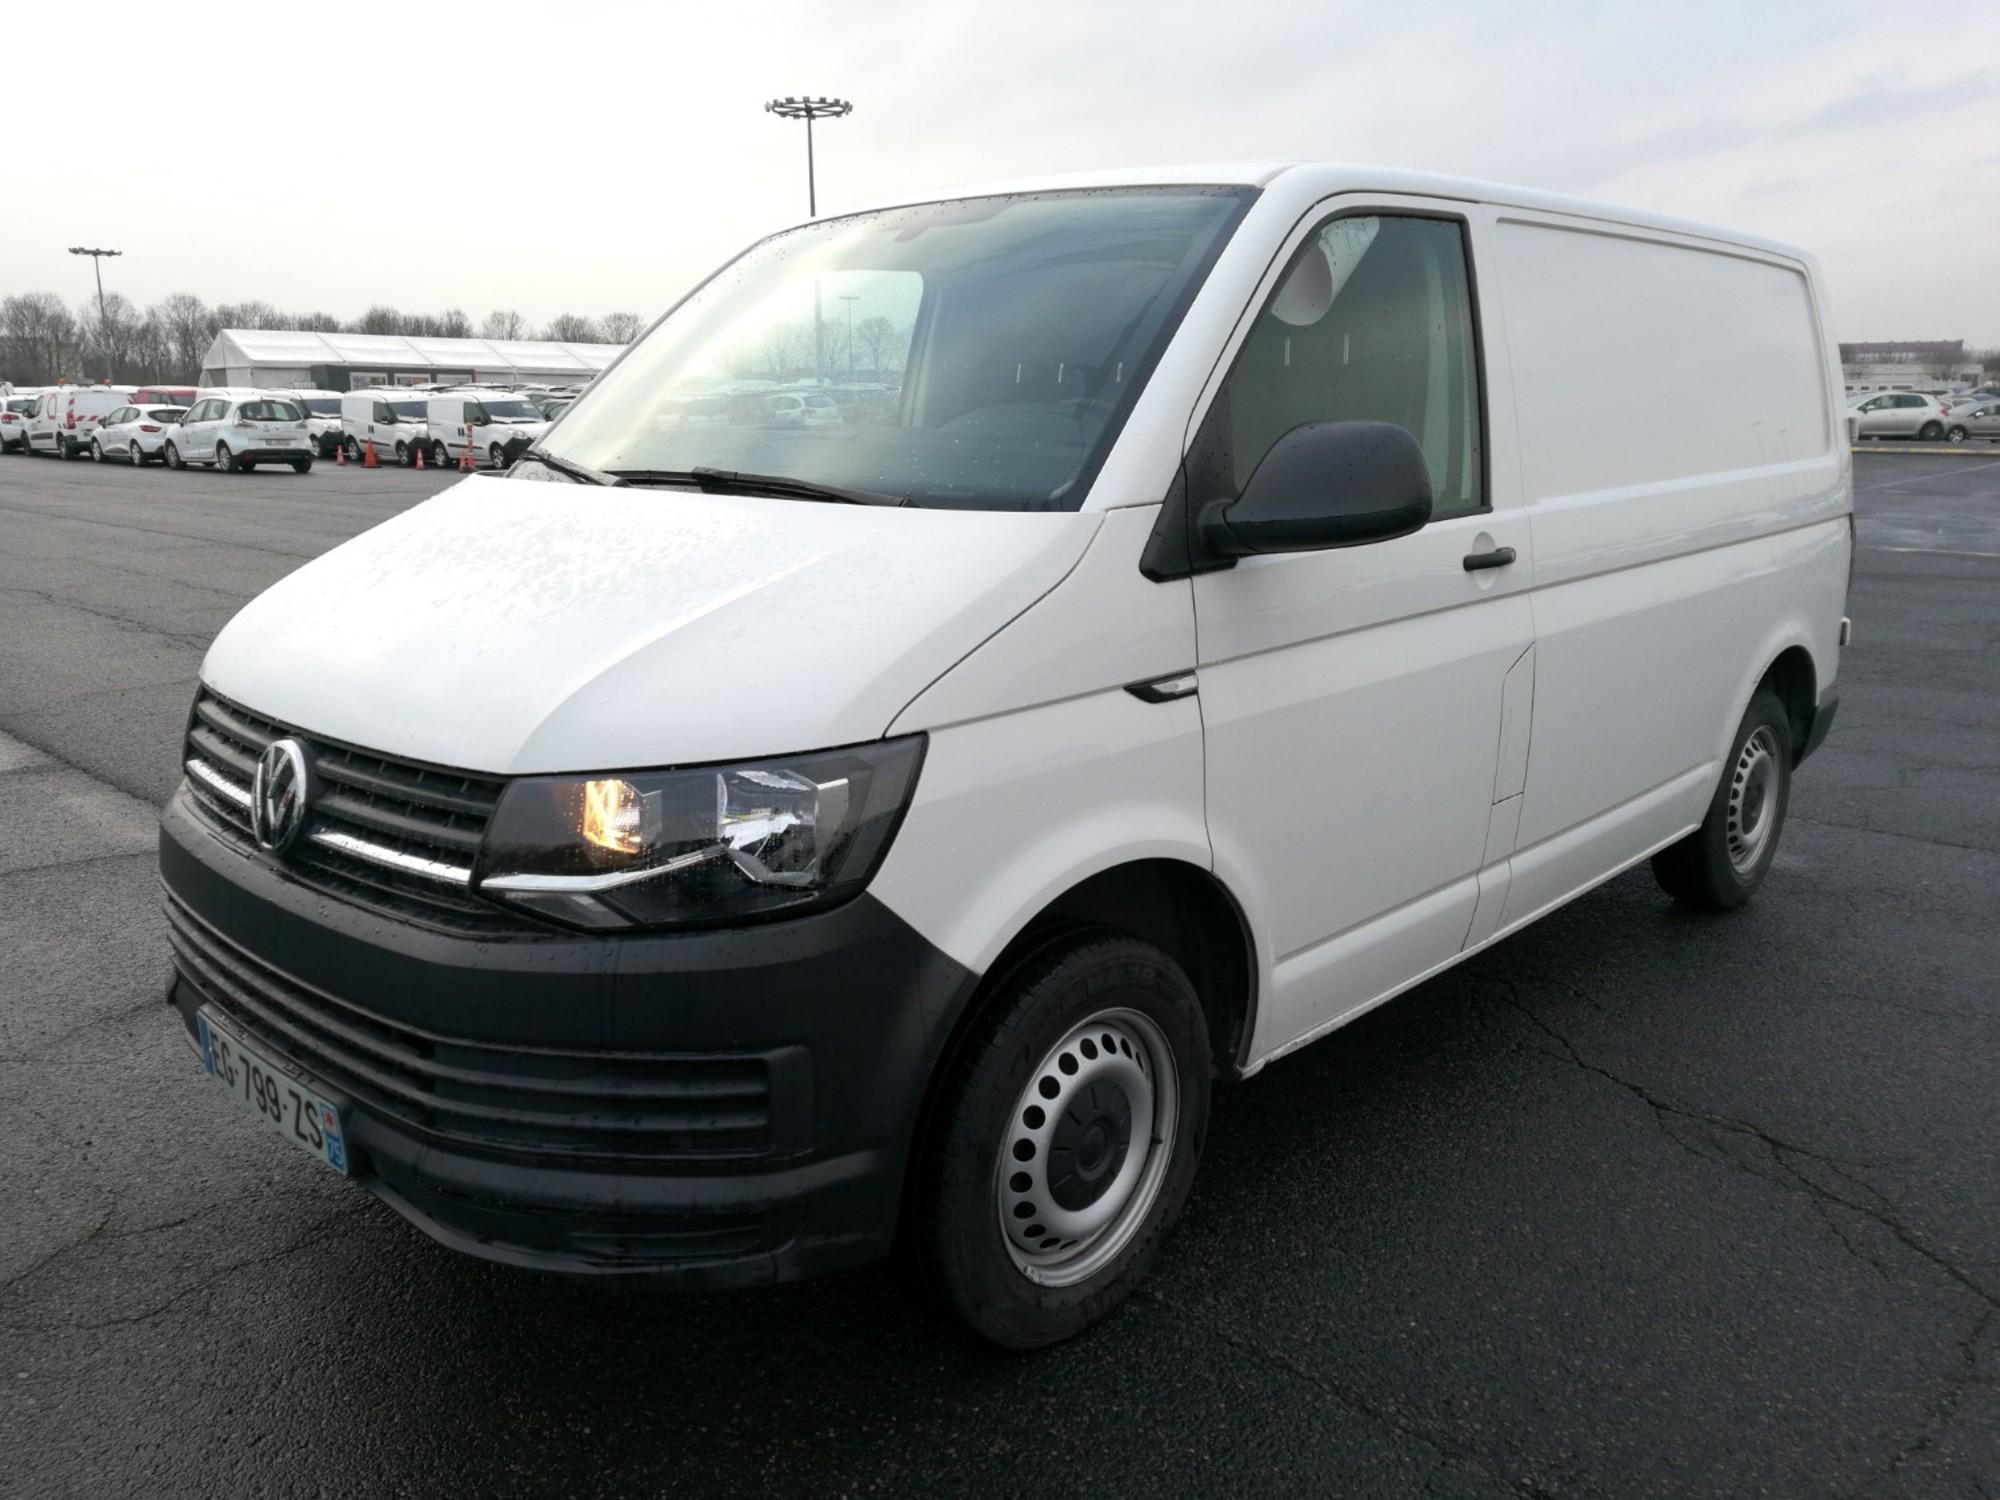 volkswagen transporter 102cv eg799zs utilitaire d 39 occasion aux ench res agorastore. Black Bedroom Furniture Sets. Home Design Ideas